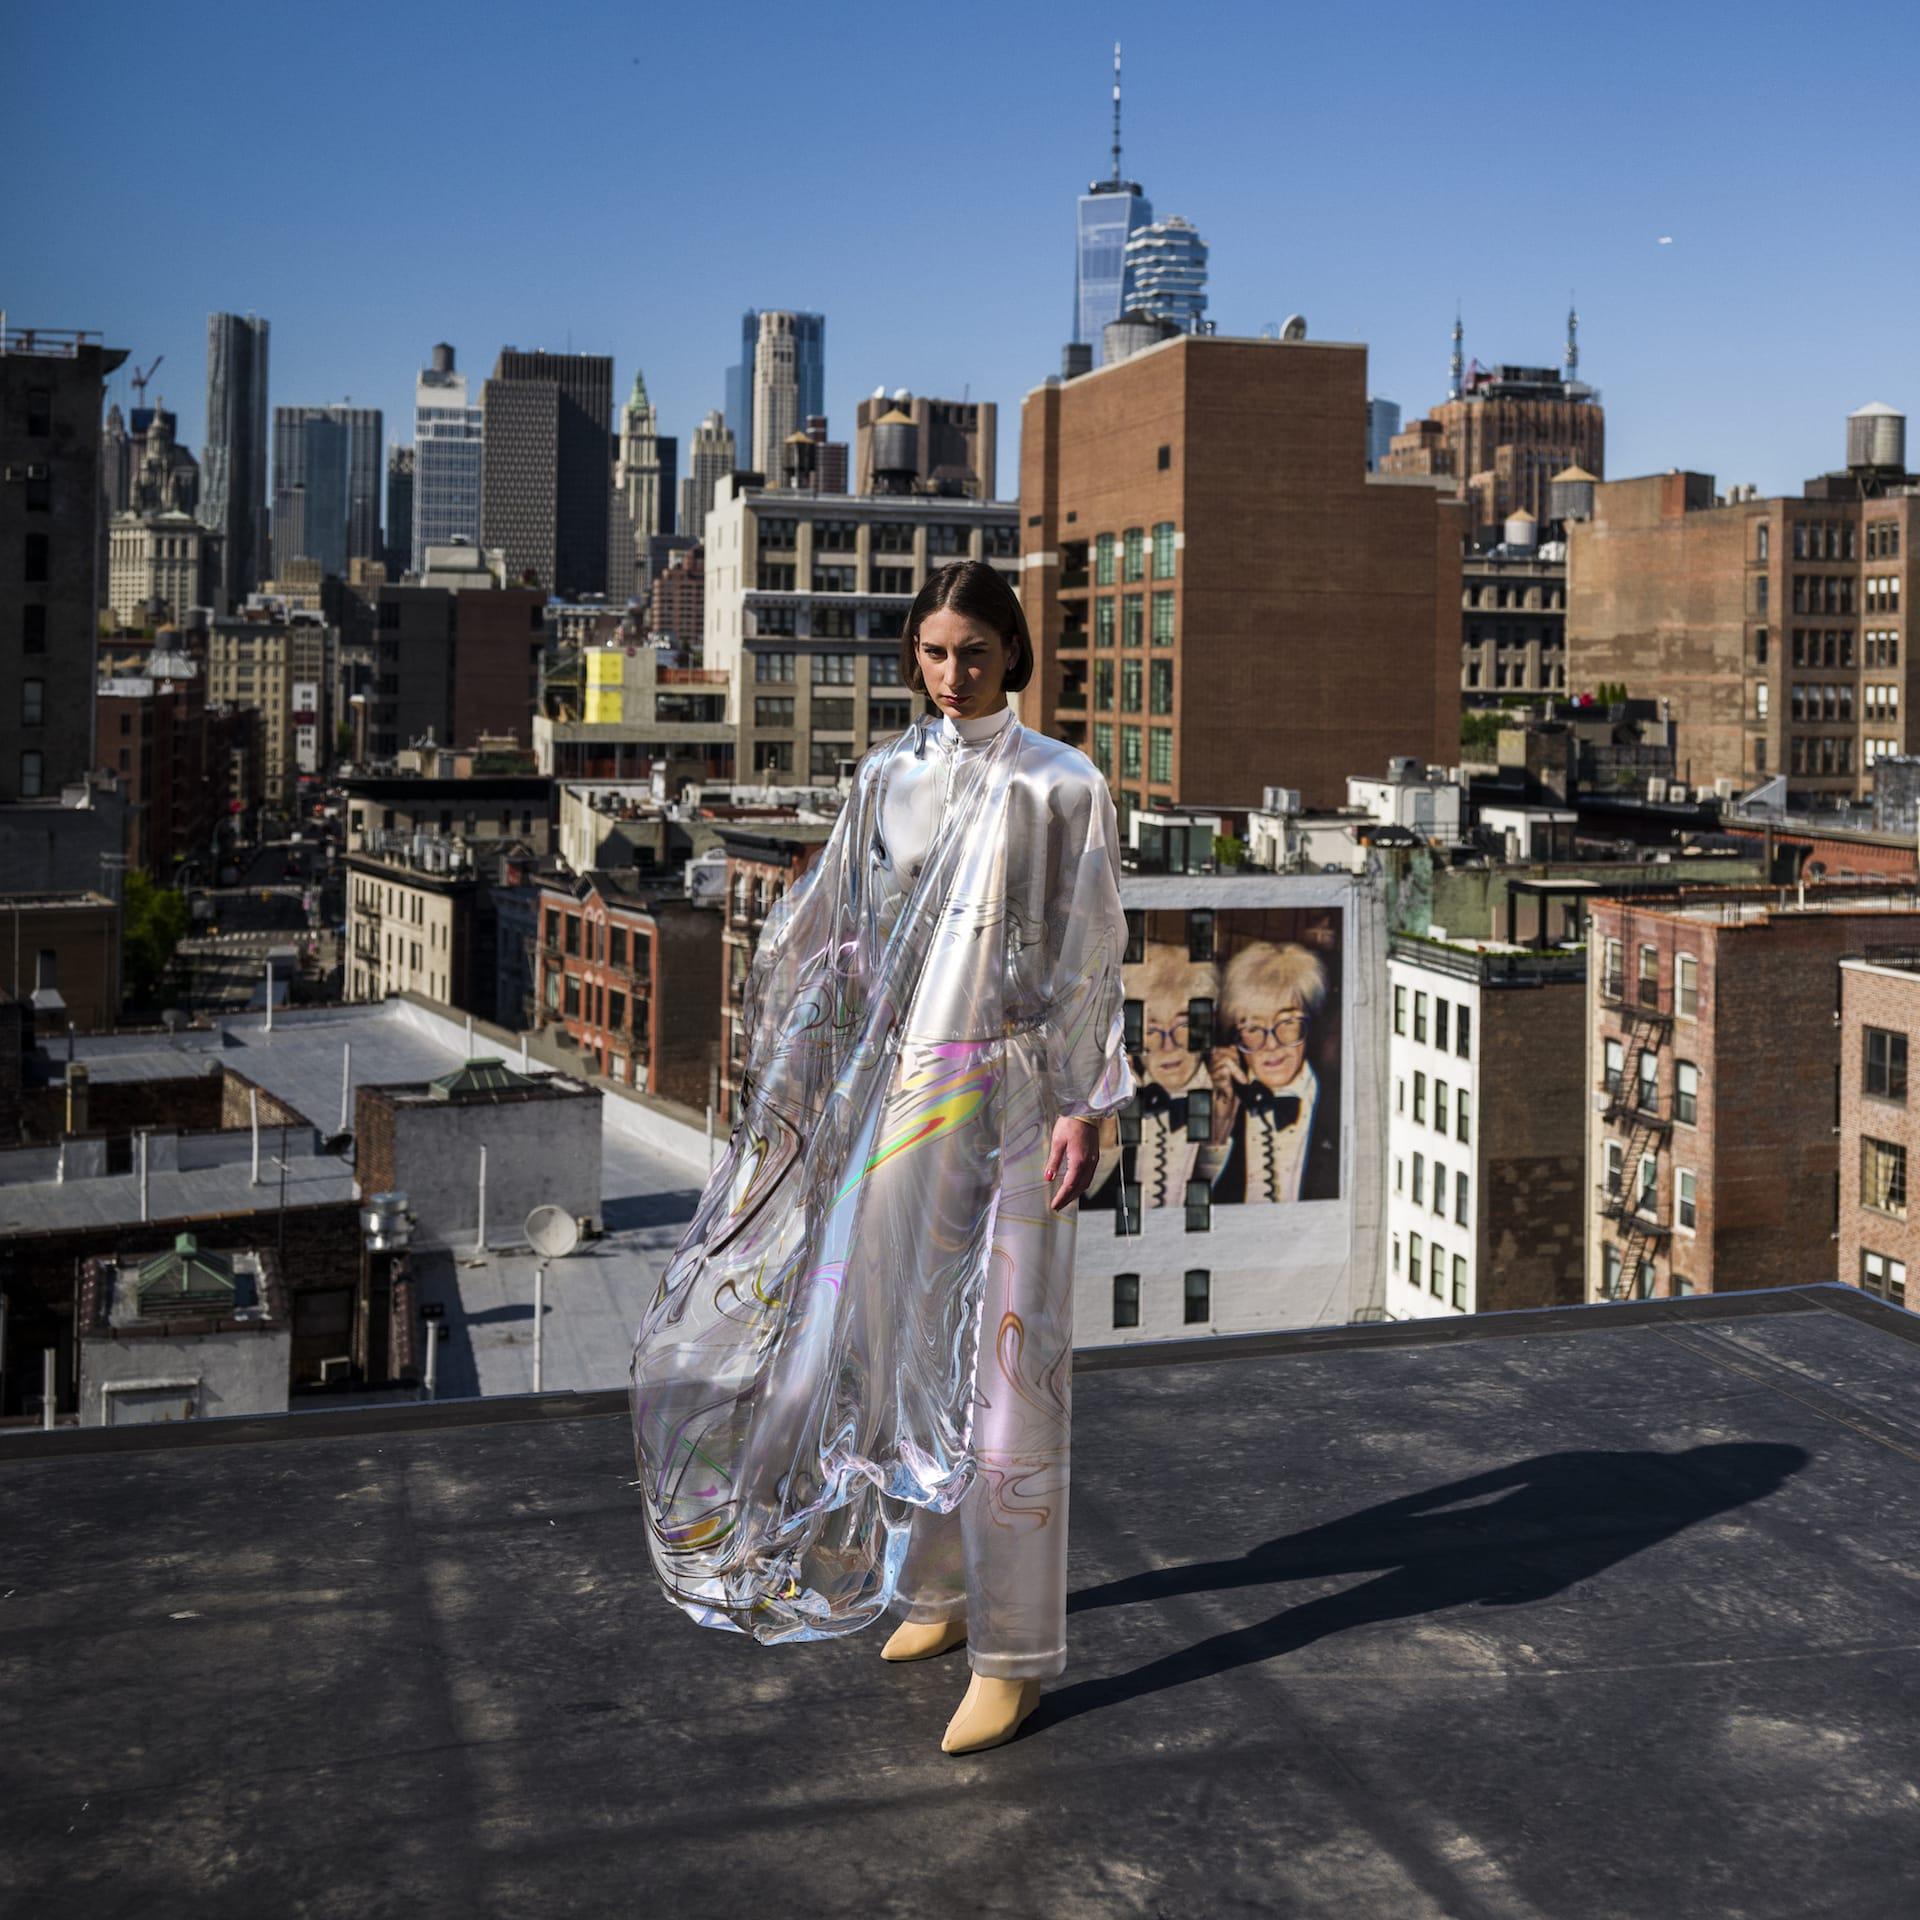 Dreaming of Digital Fashion